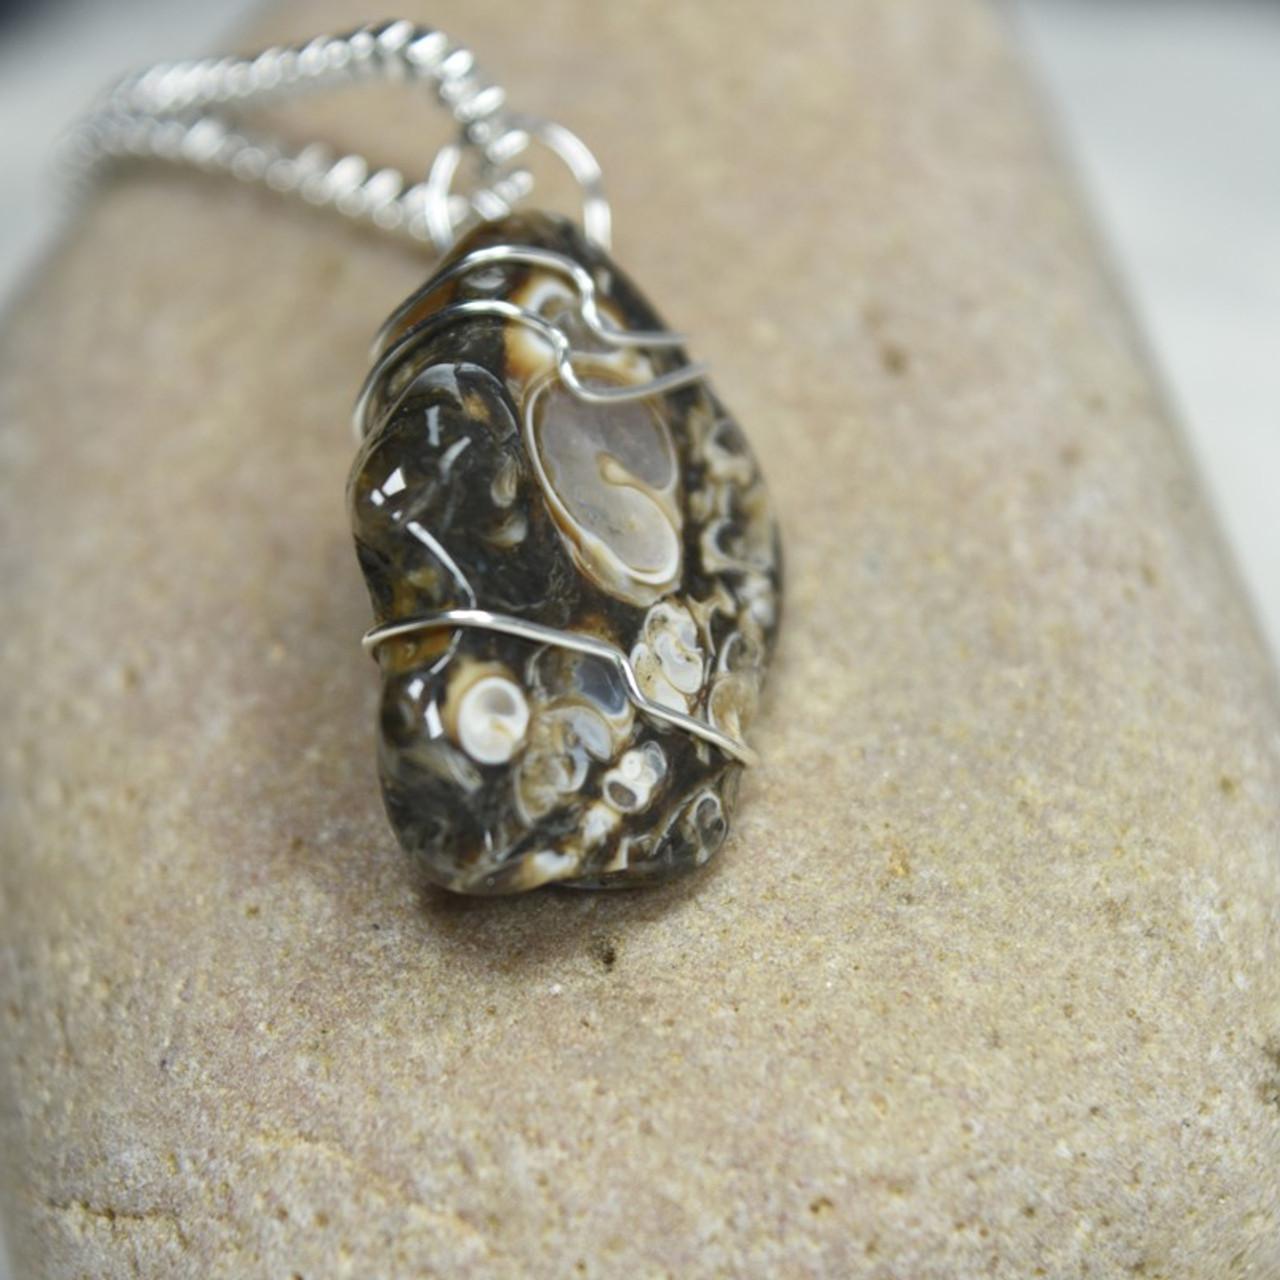 Tumbled Turritella Stone Pendant